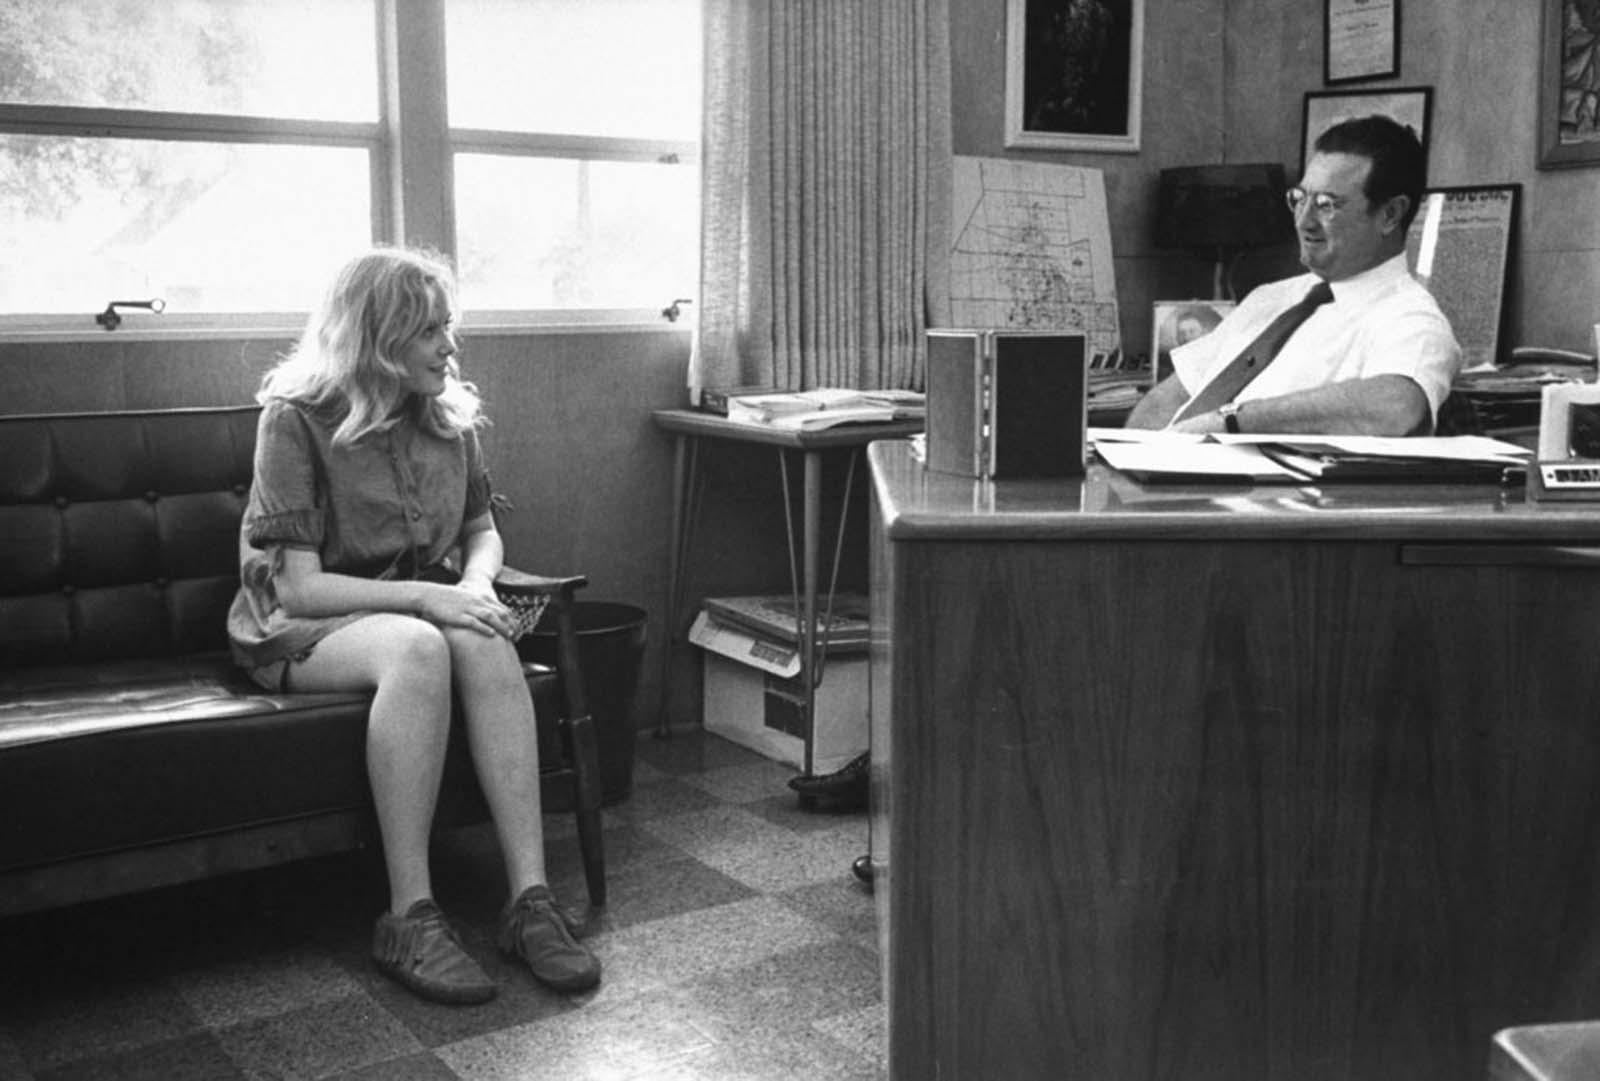 teen_pregnancy_1970s (8).jpg